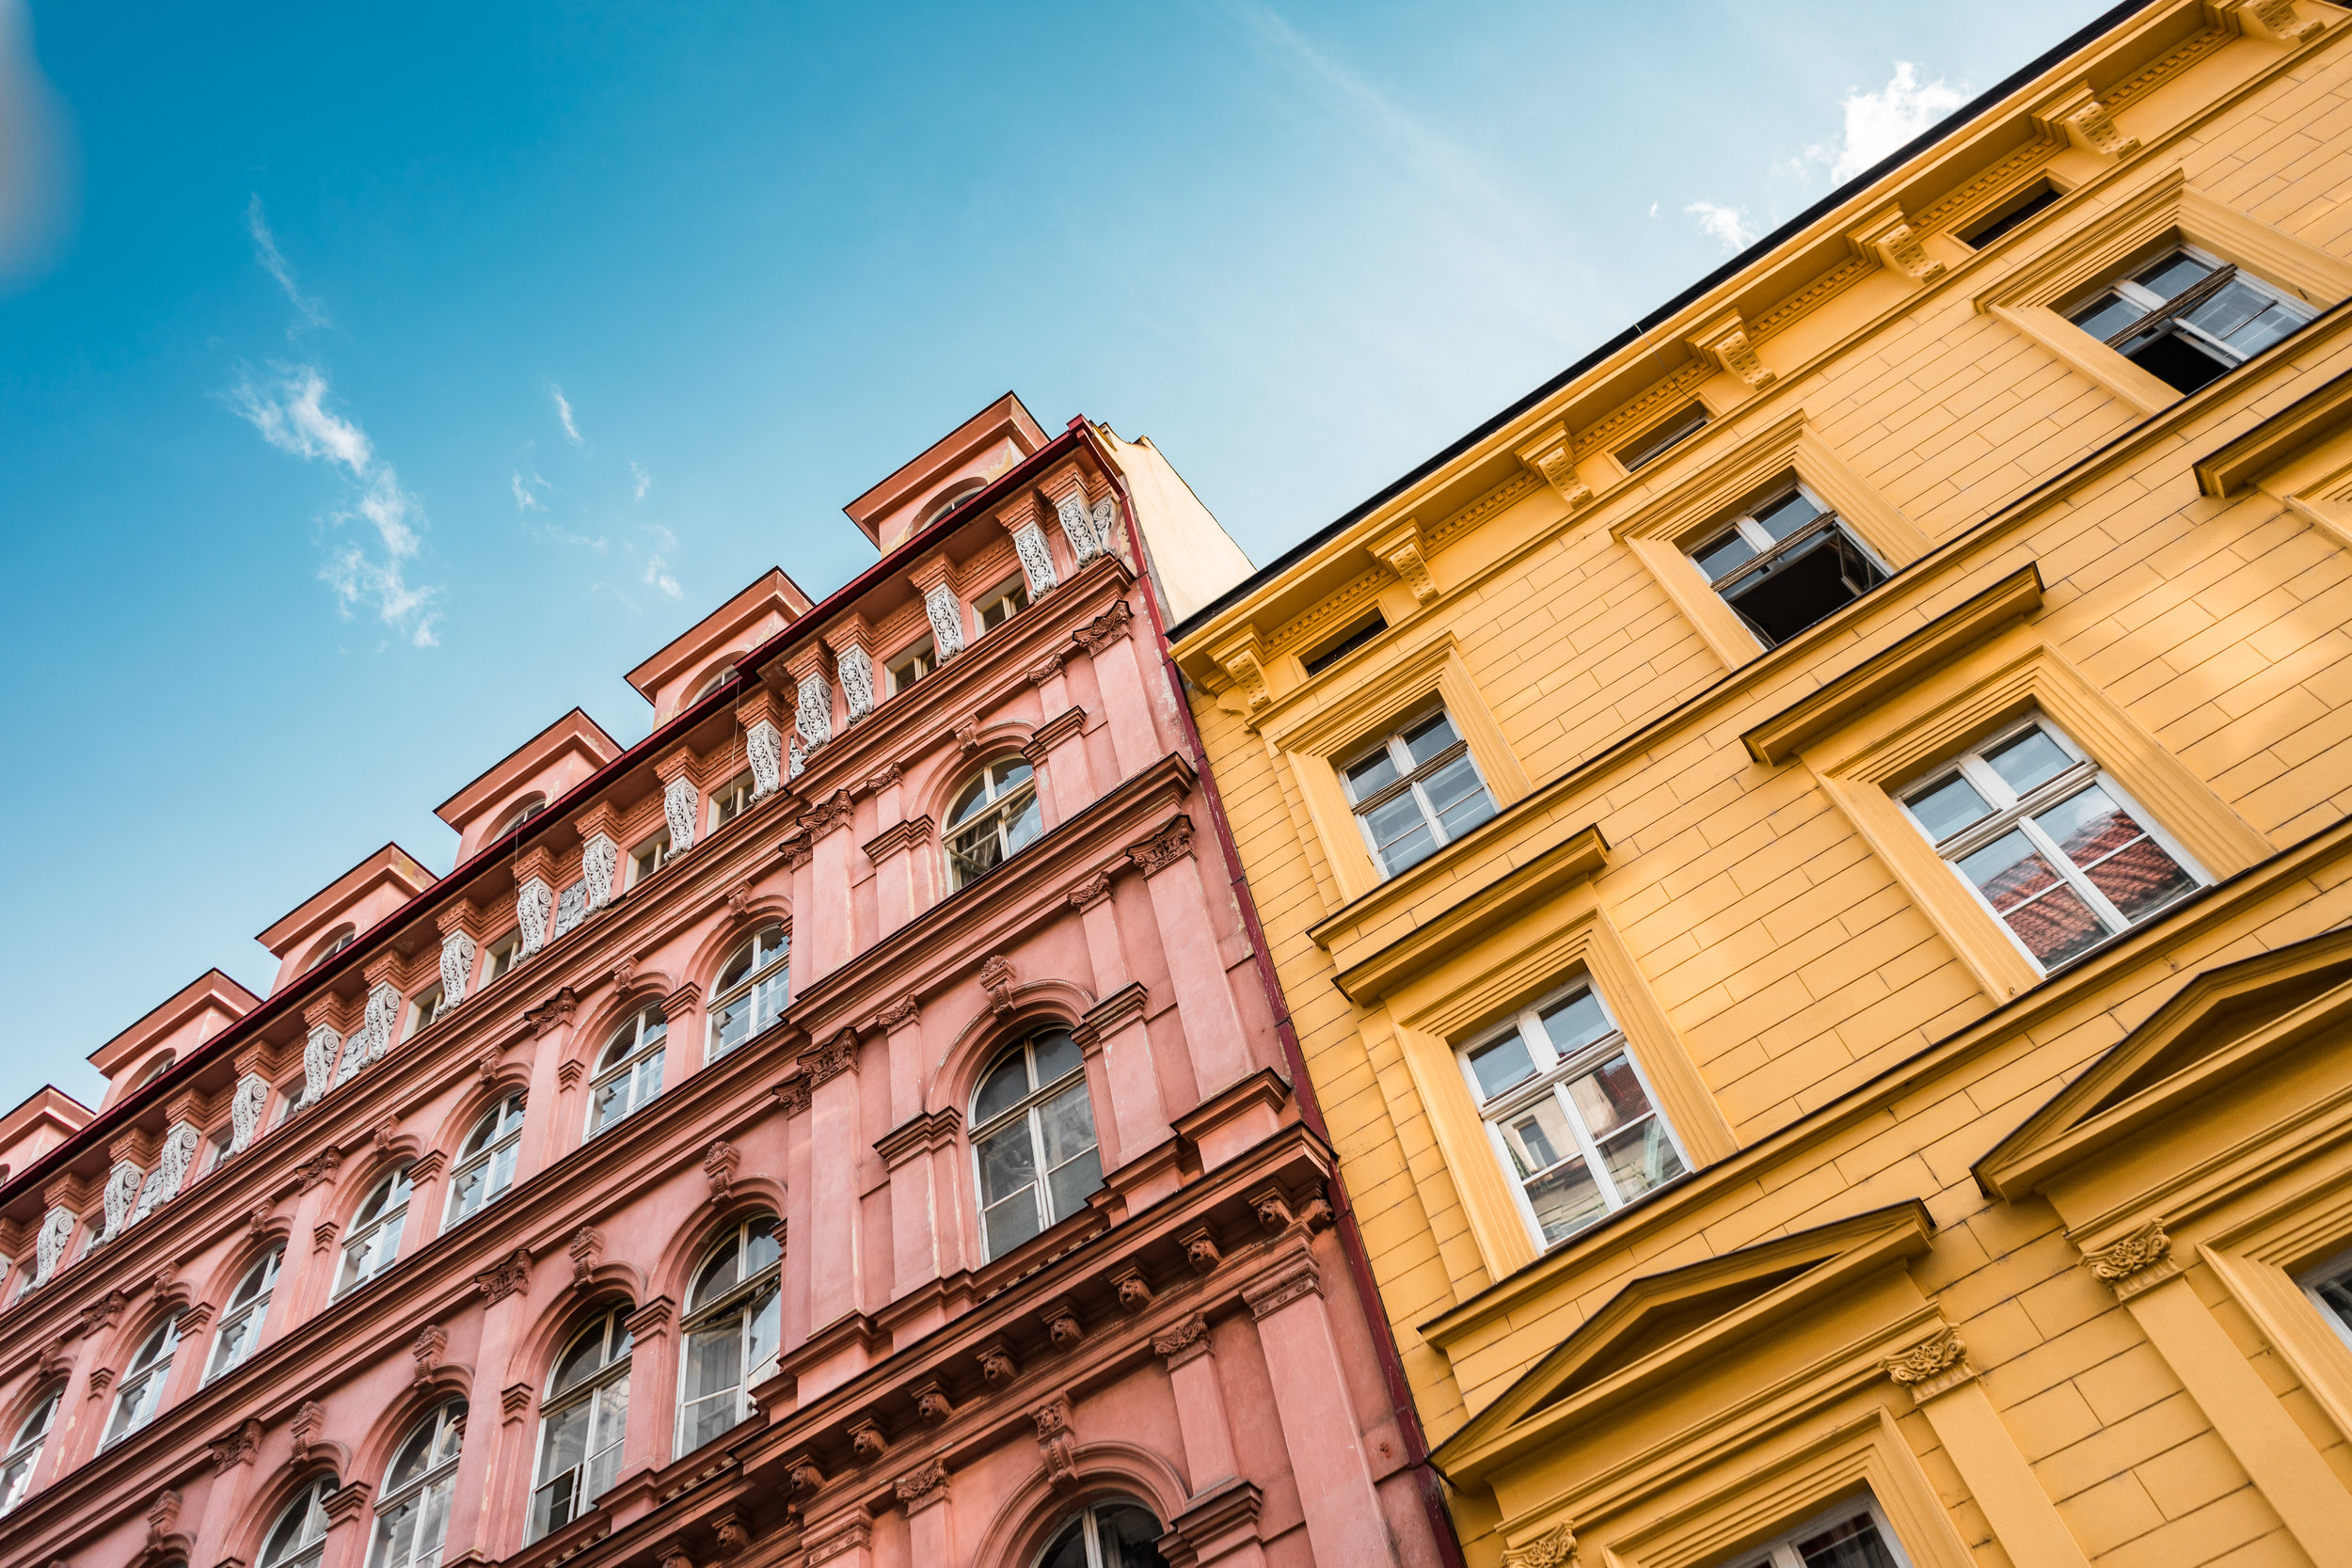 random-buildings-in-prague-czechia-picjumbo-com.jpg